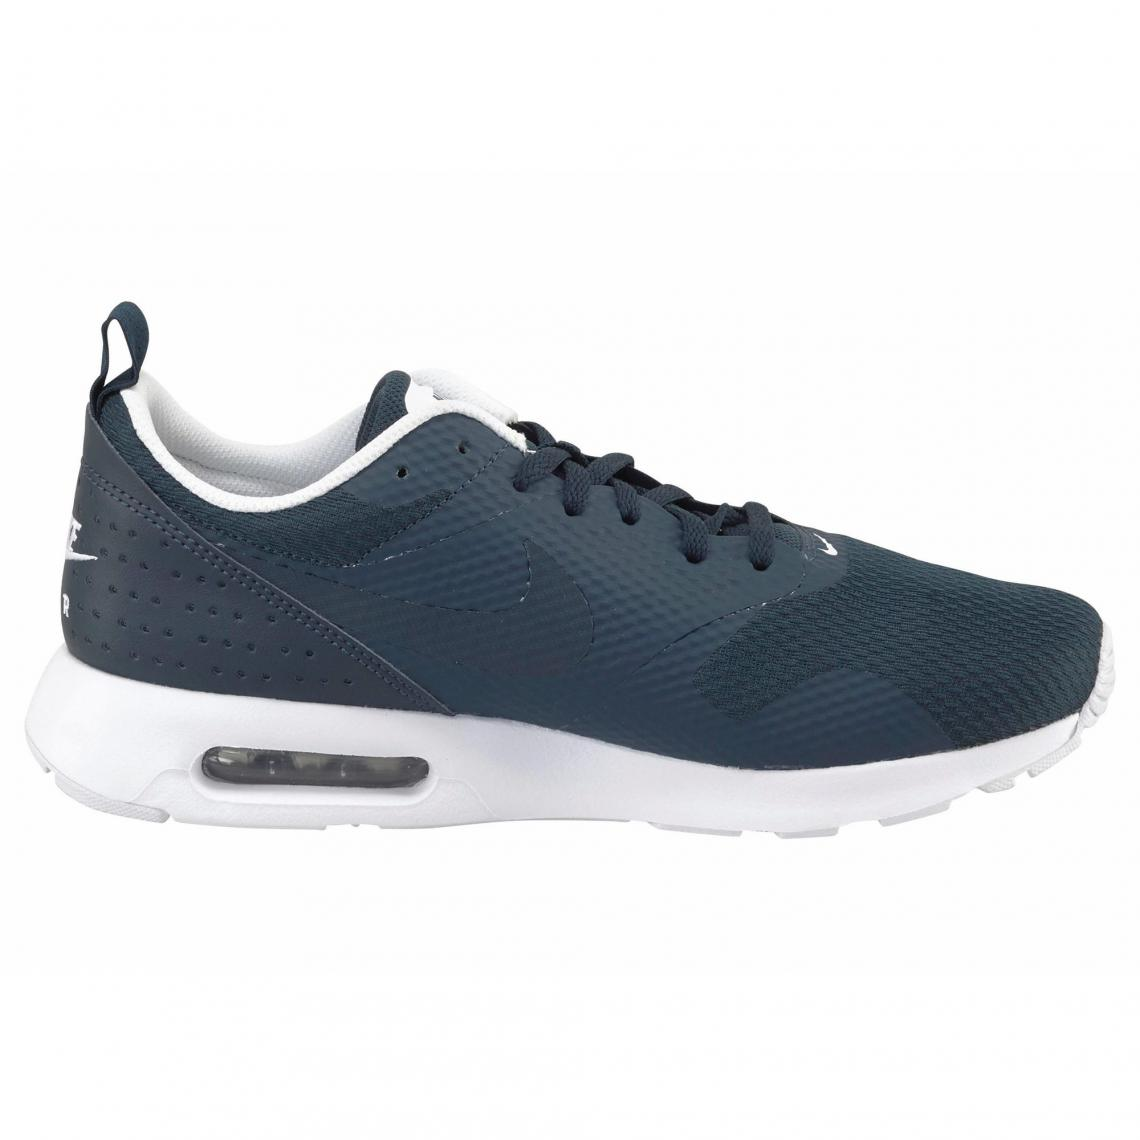 Homme De Air Nike Running 3suisses Chaussures Tavas Max Marine IwpvqBYa